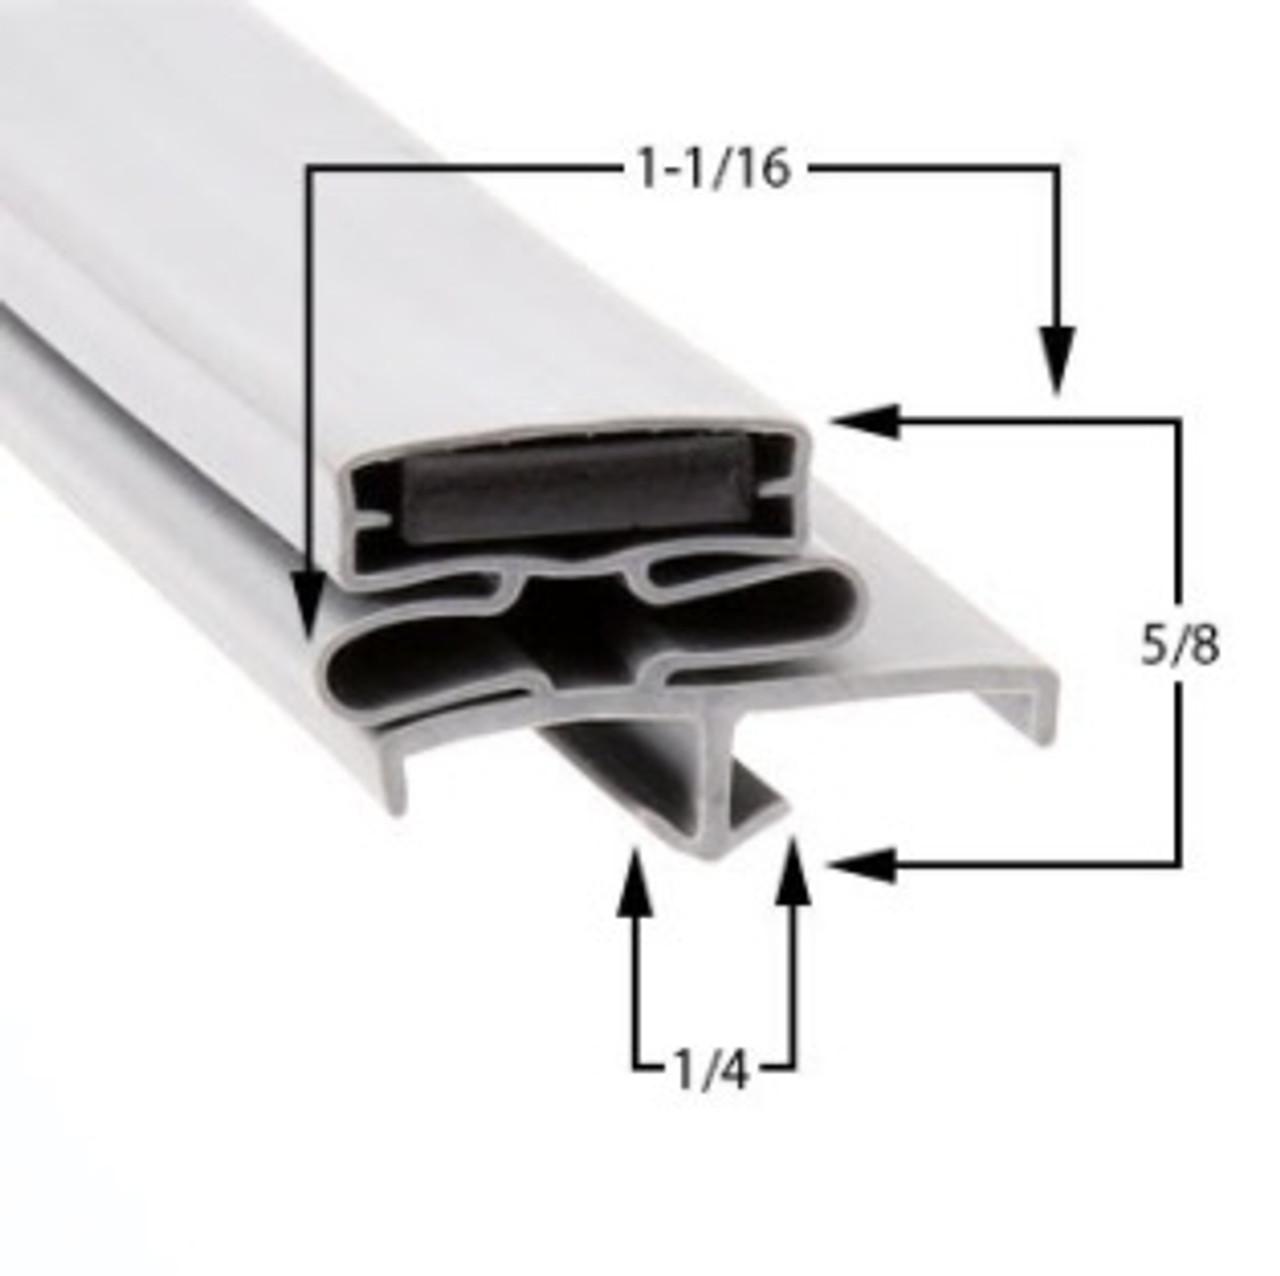 Delfield Door Gasket Profile 168 15 7/8 x 33 7/8 -A2.0858-2